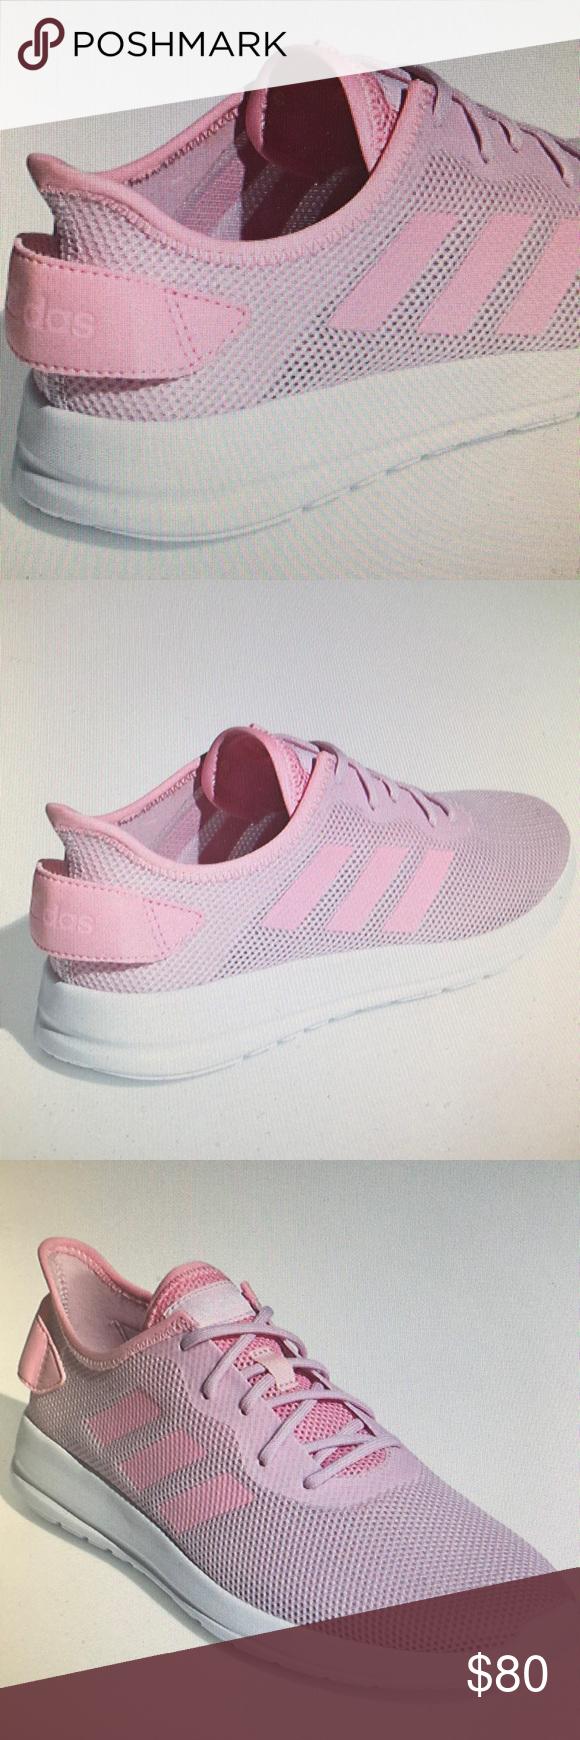 adidas Womens Yatra Fitness Shoes opa